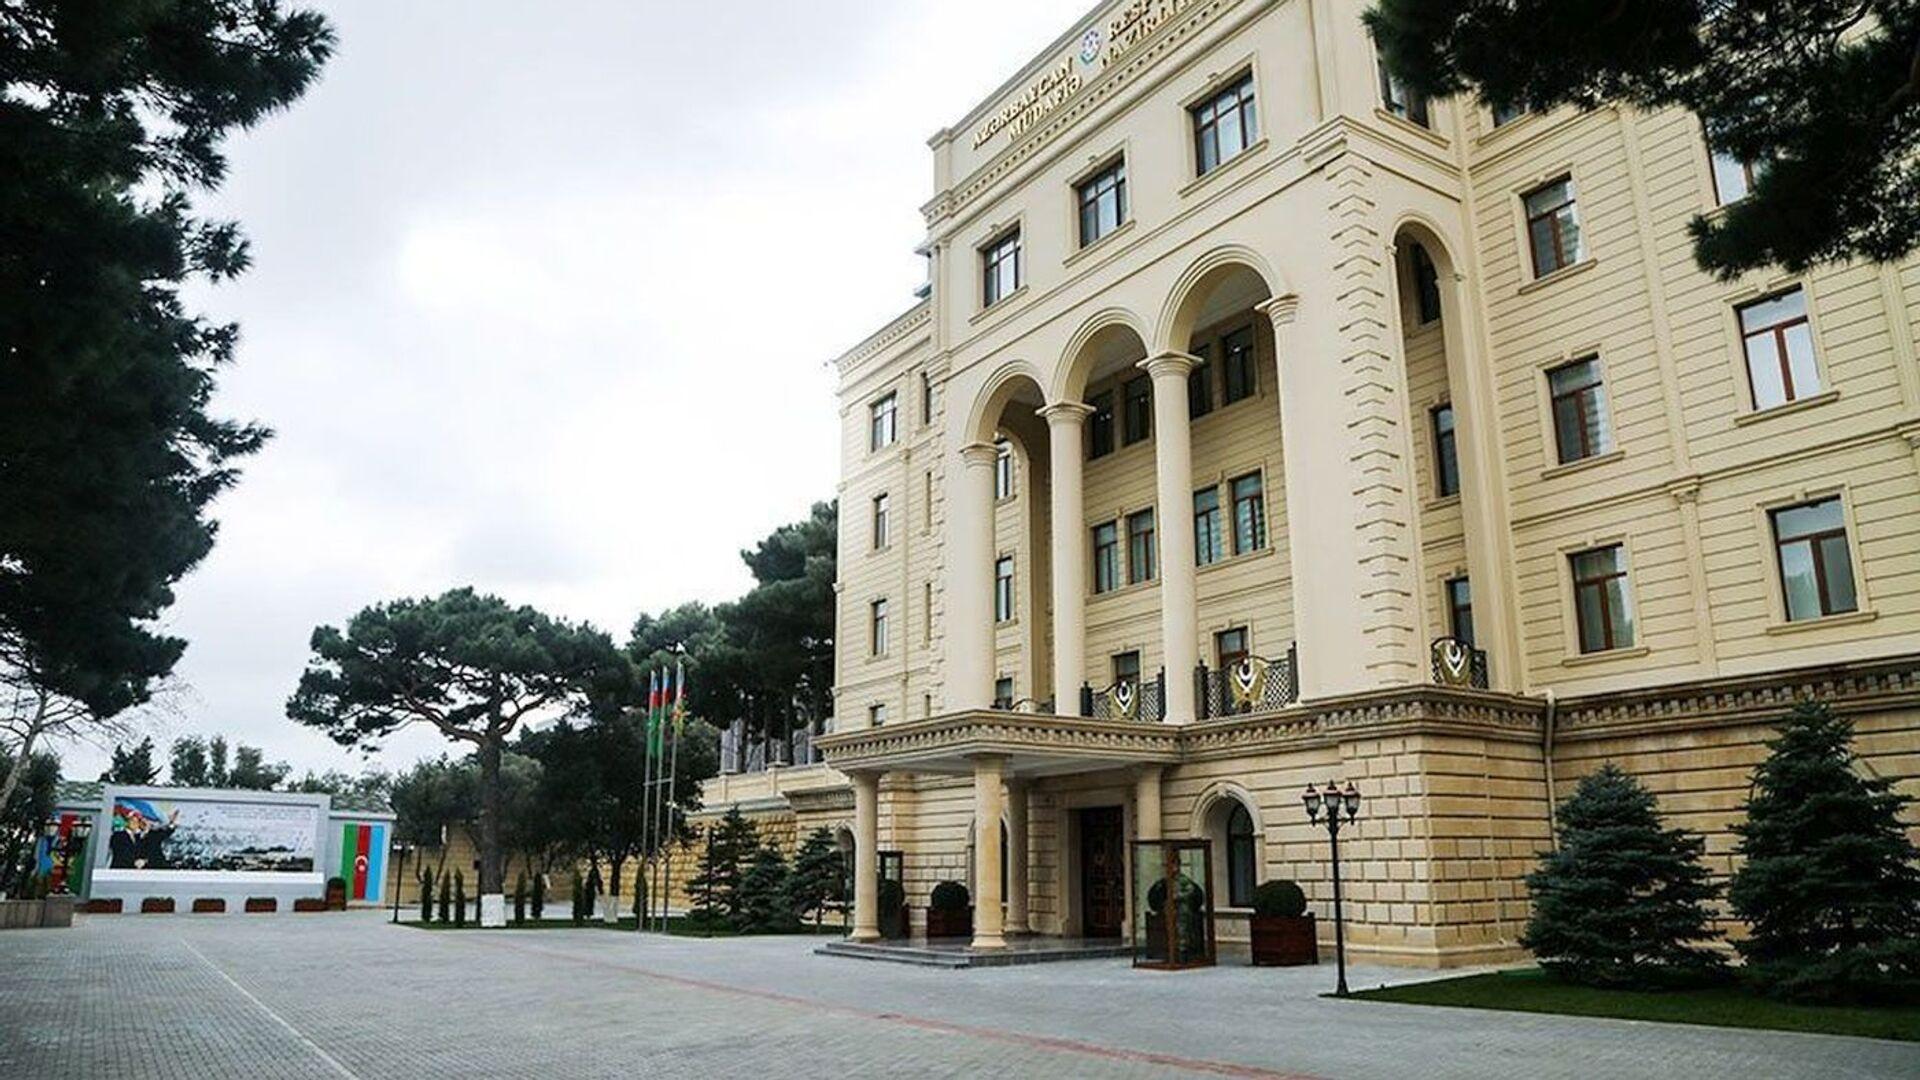 Здание Министерства Обороны Азербайджана - Sputnik Азербайджан, 1920, 26.08.2021